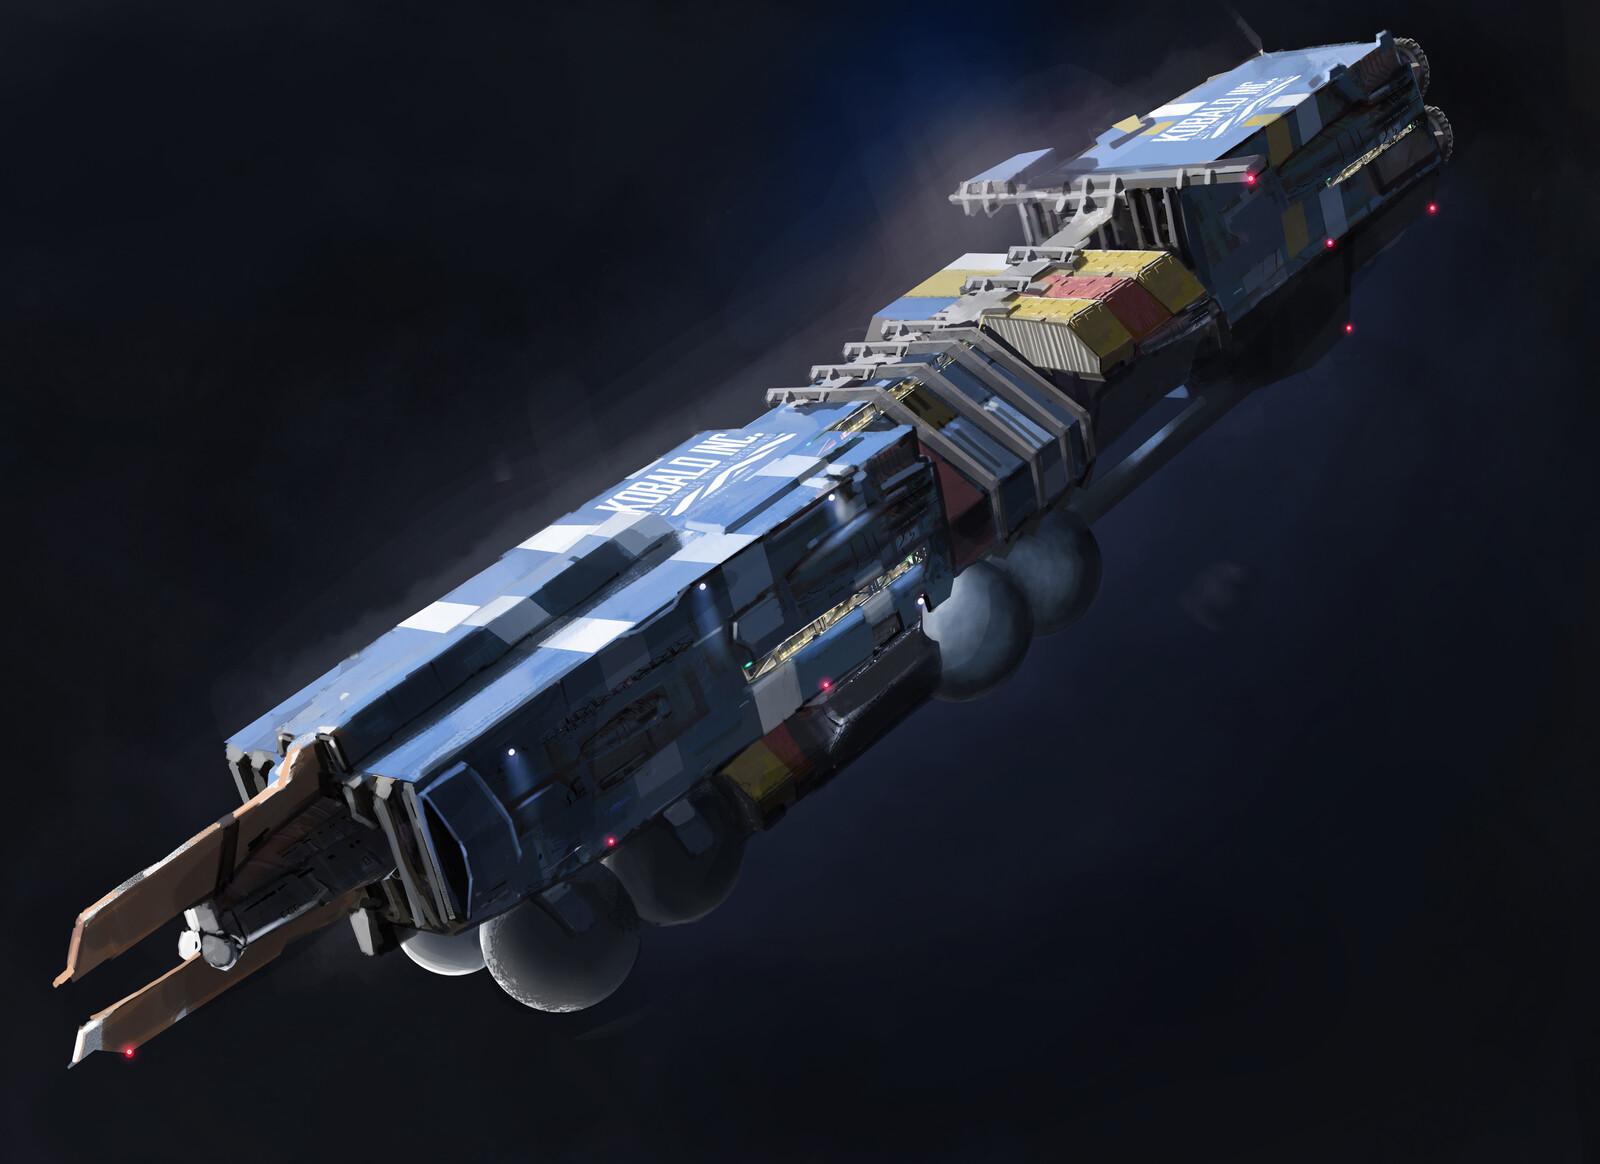 Cargoship number 2